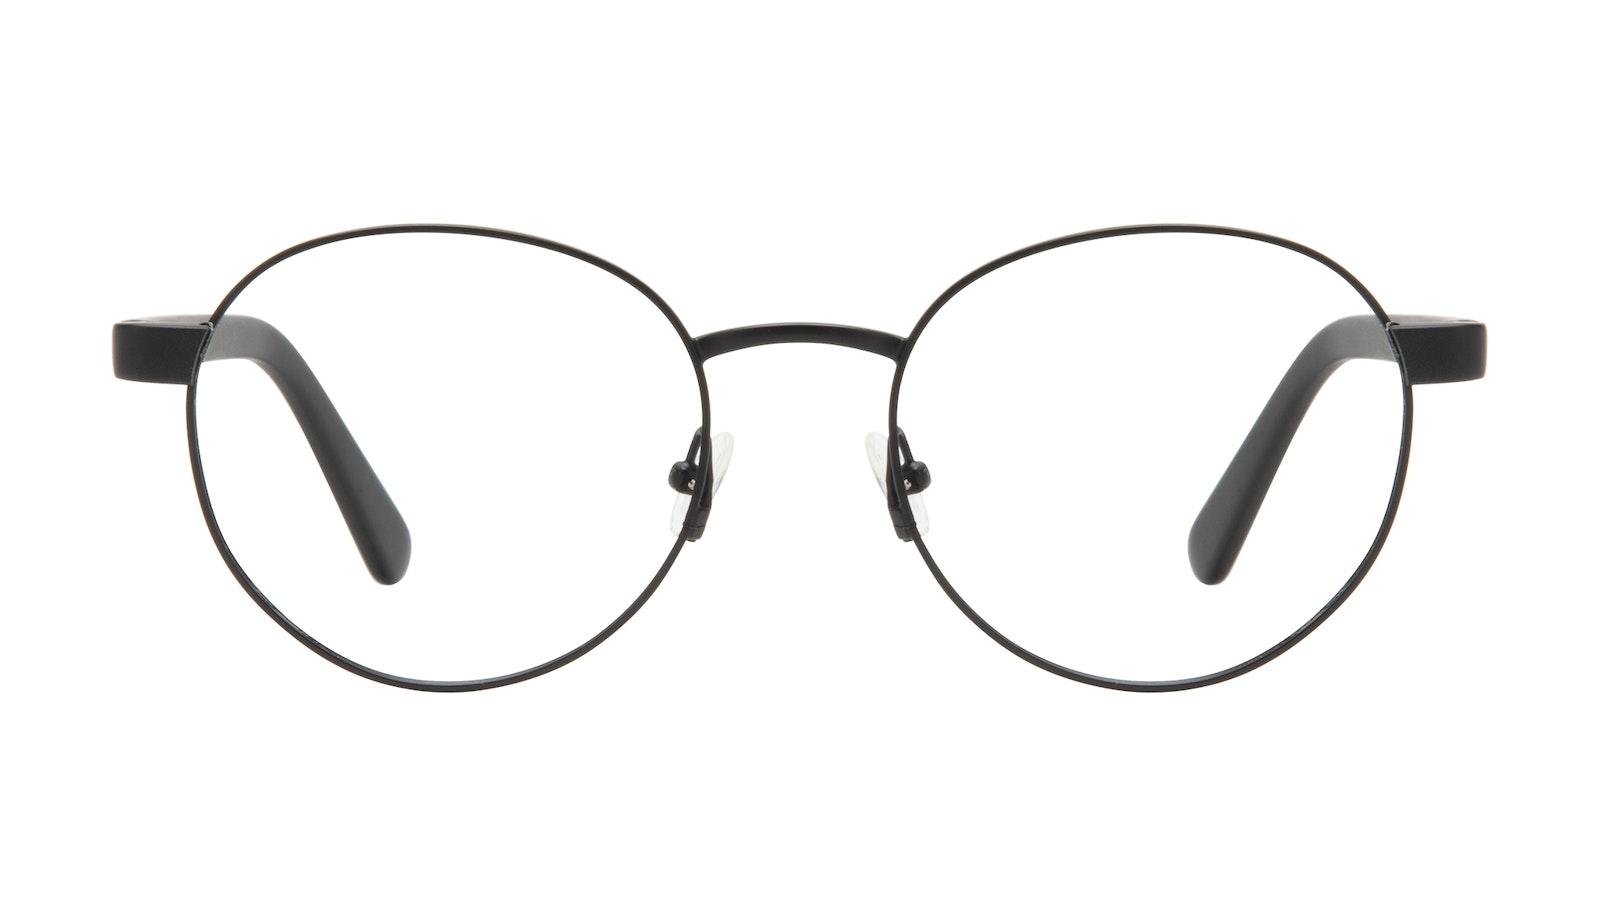 Affordable Fashion Glasses Round Eyeglasses Men Alter Black